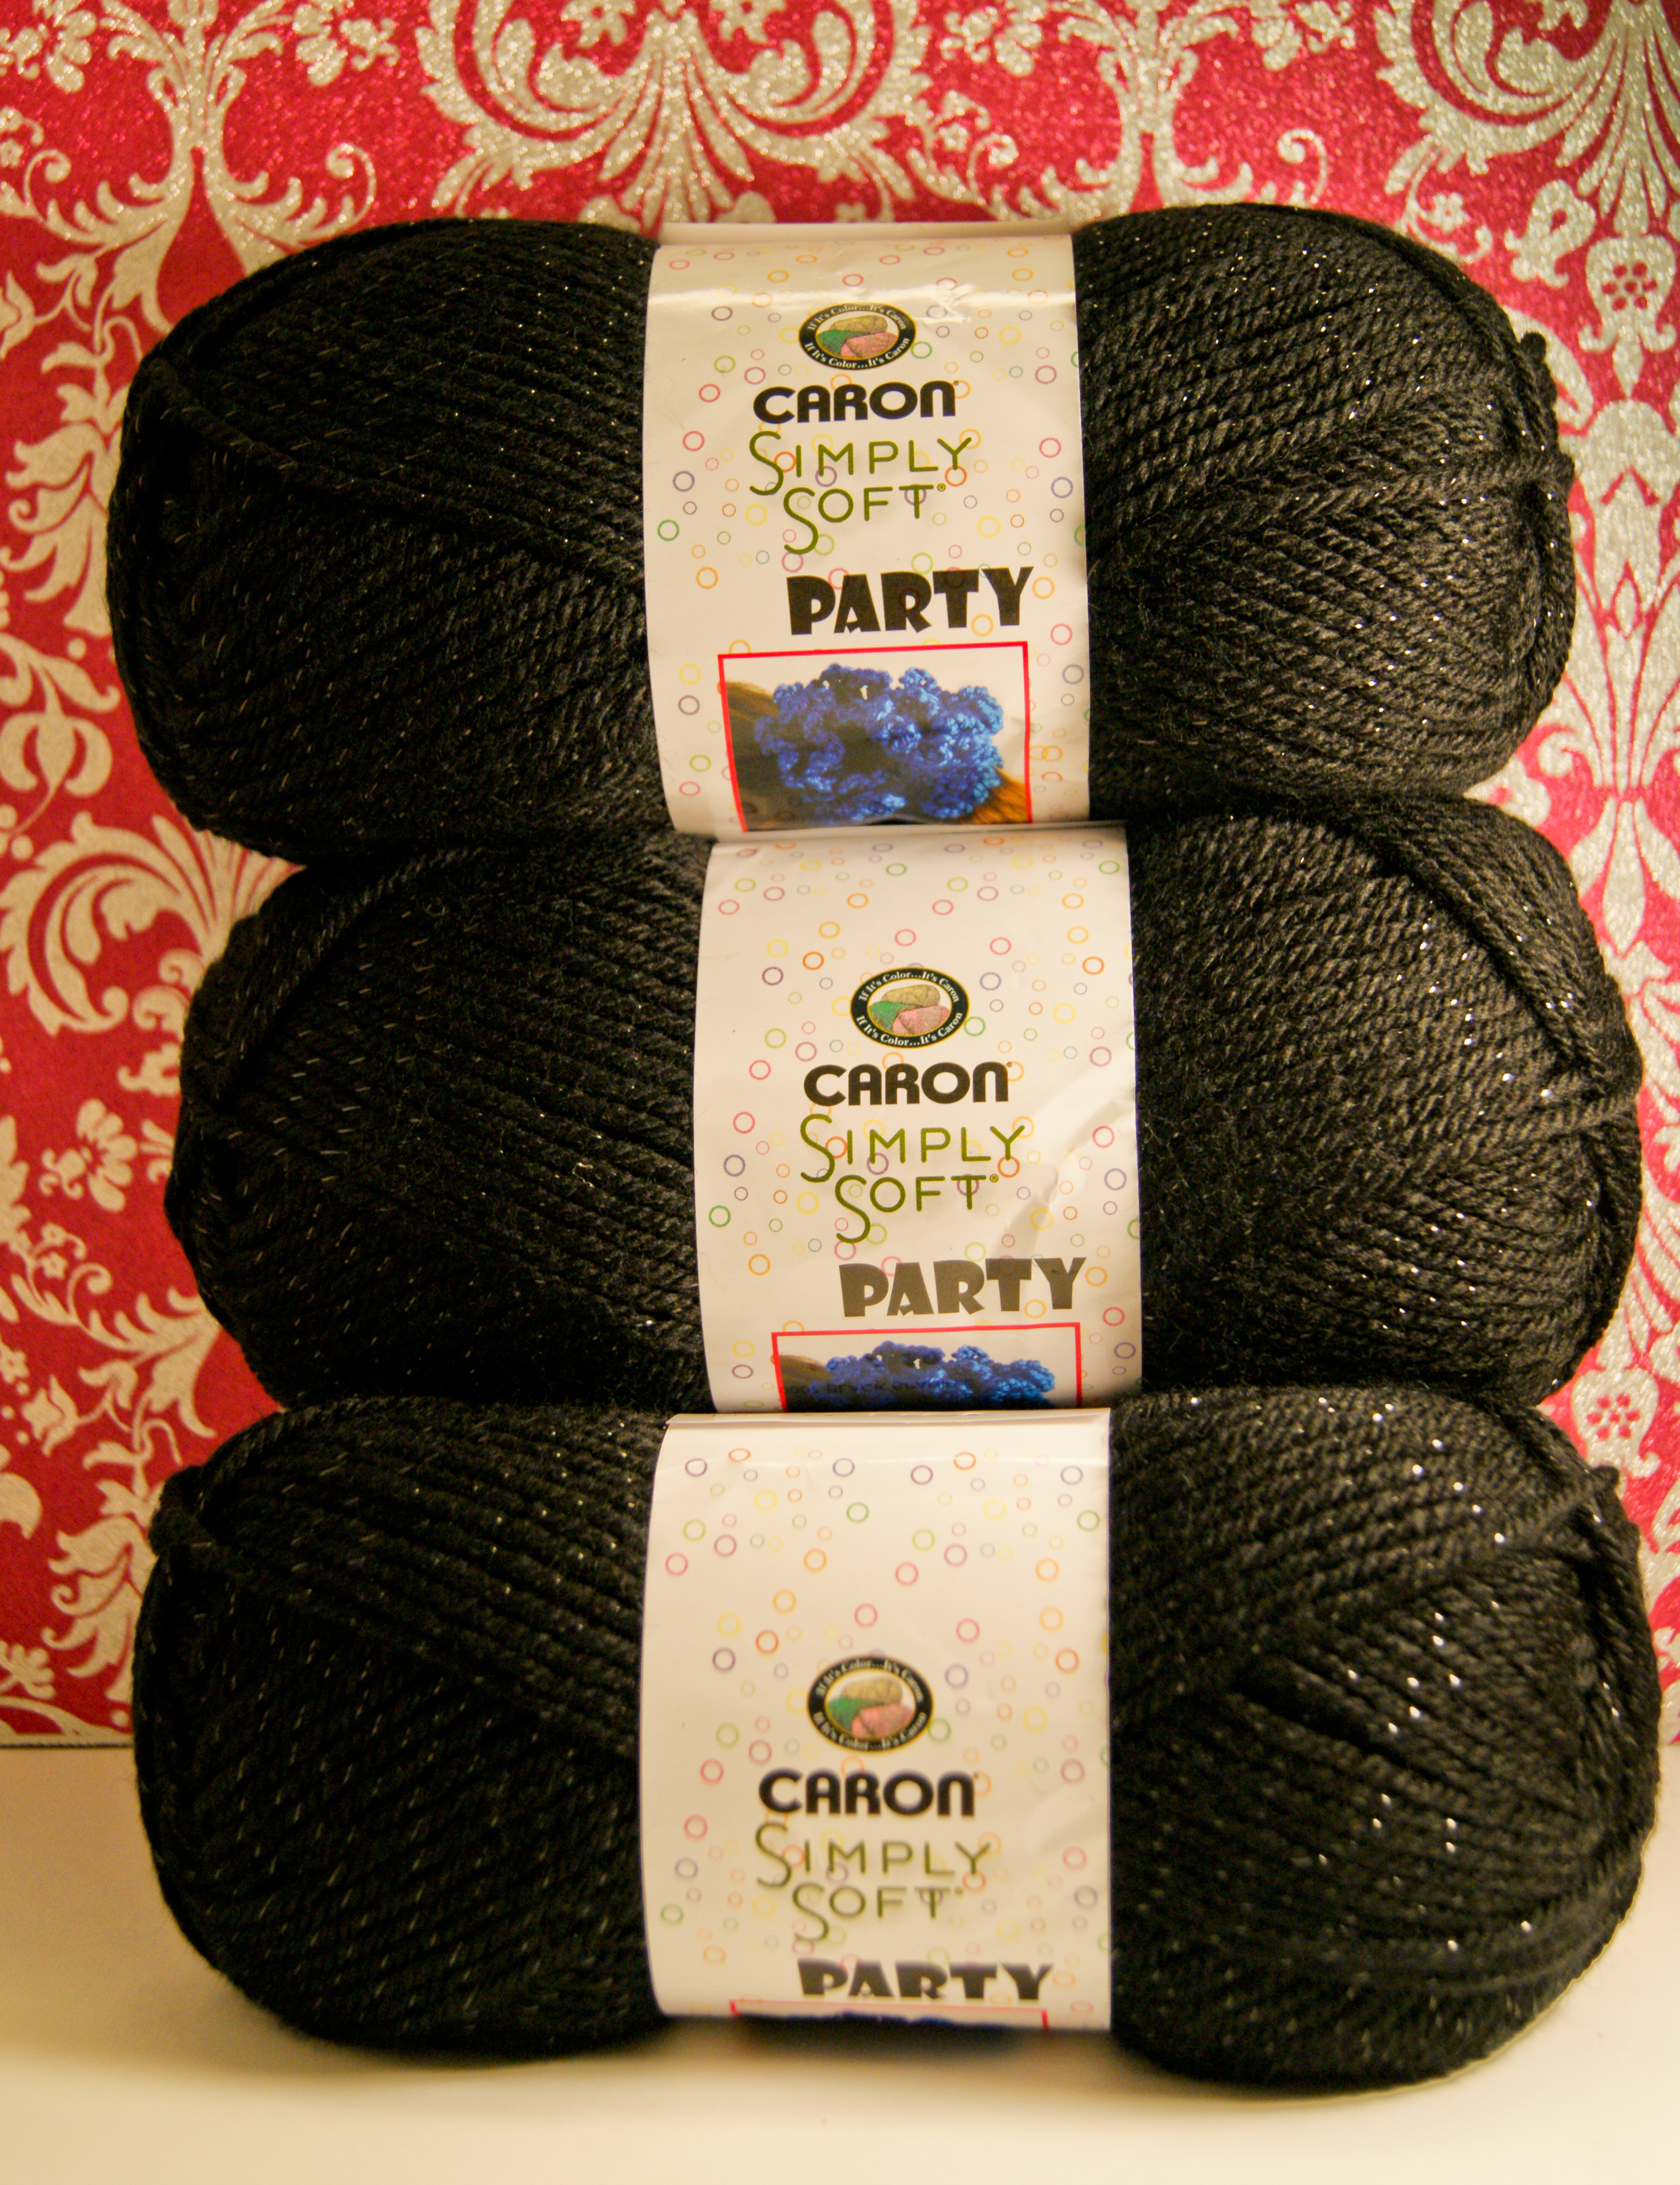 Caron Simply Soft Party Yarn Stitch And Unwind